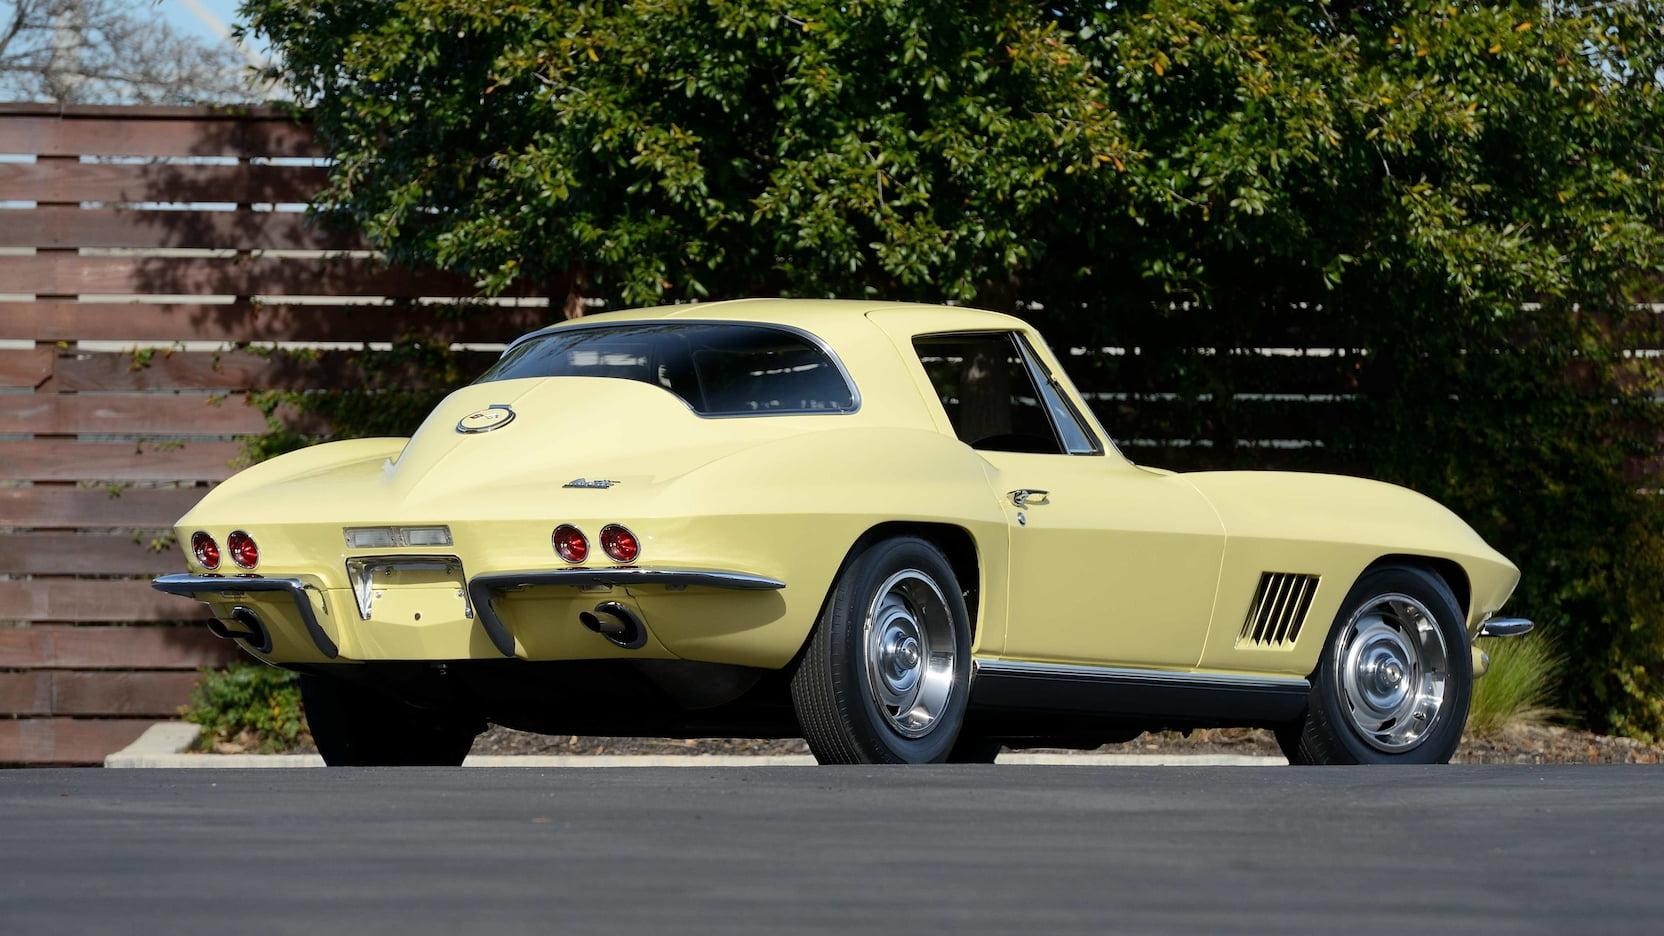 1967 Chevrolet Corvette L88 Rear 3/4